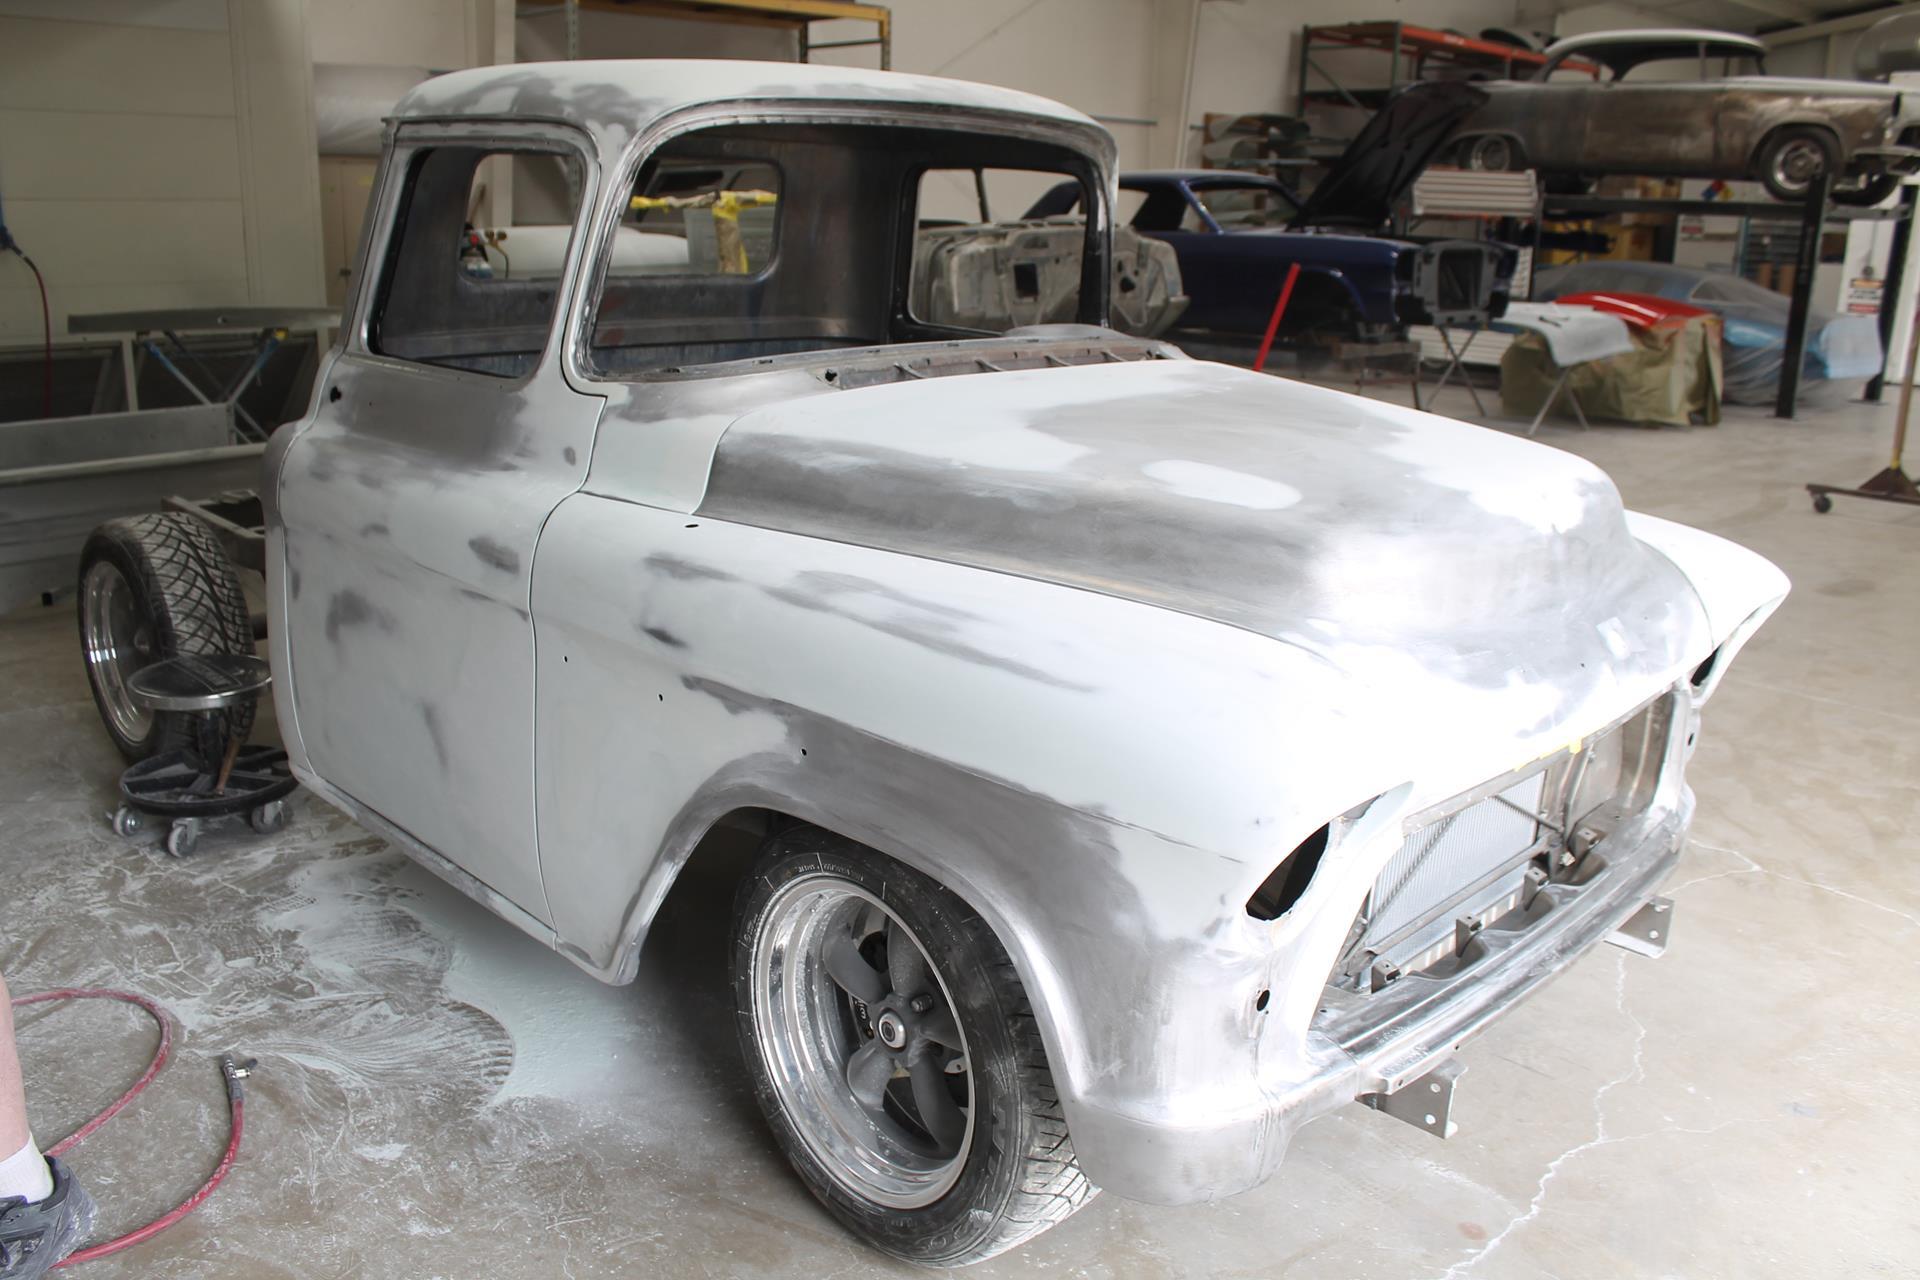 1955 Chevy truck - MetalWorks Classics Auto Restoration & Speed Shop